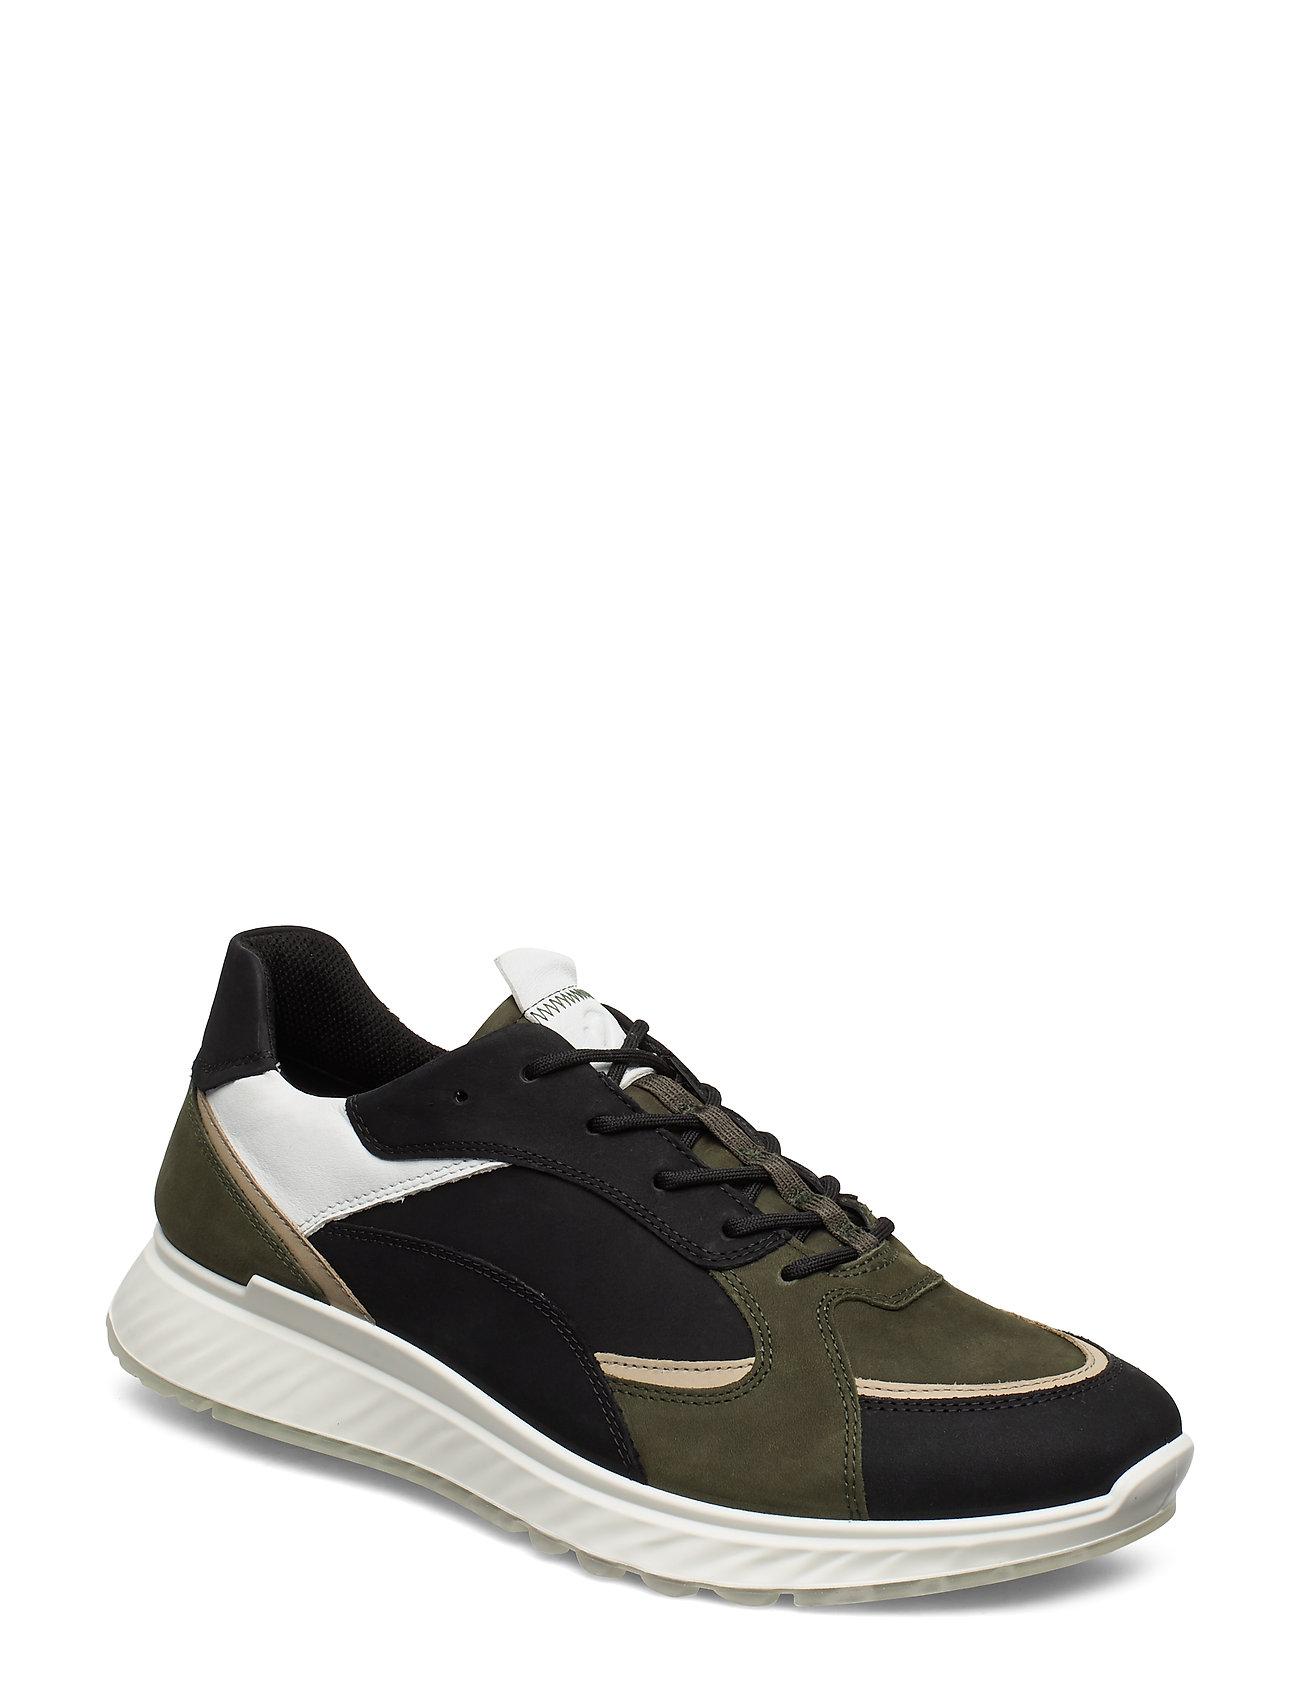 Image of St.1 M Low-top Sneakers Sort ECCO (3310629081)